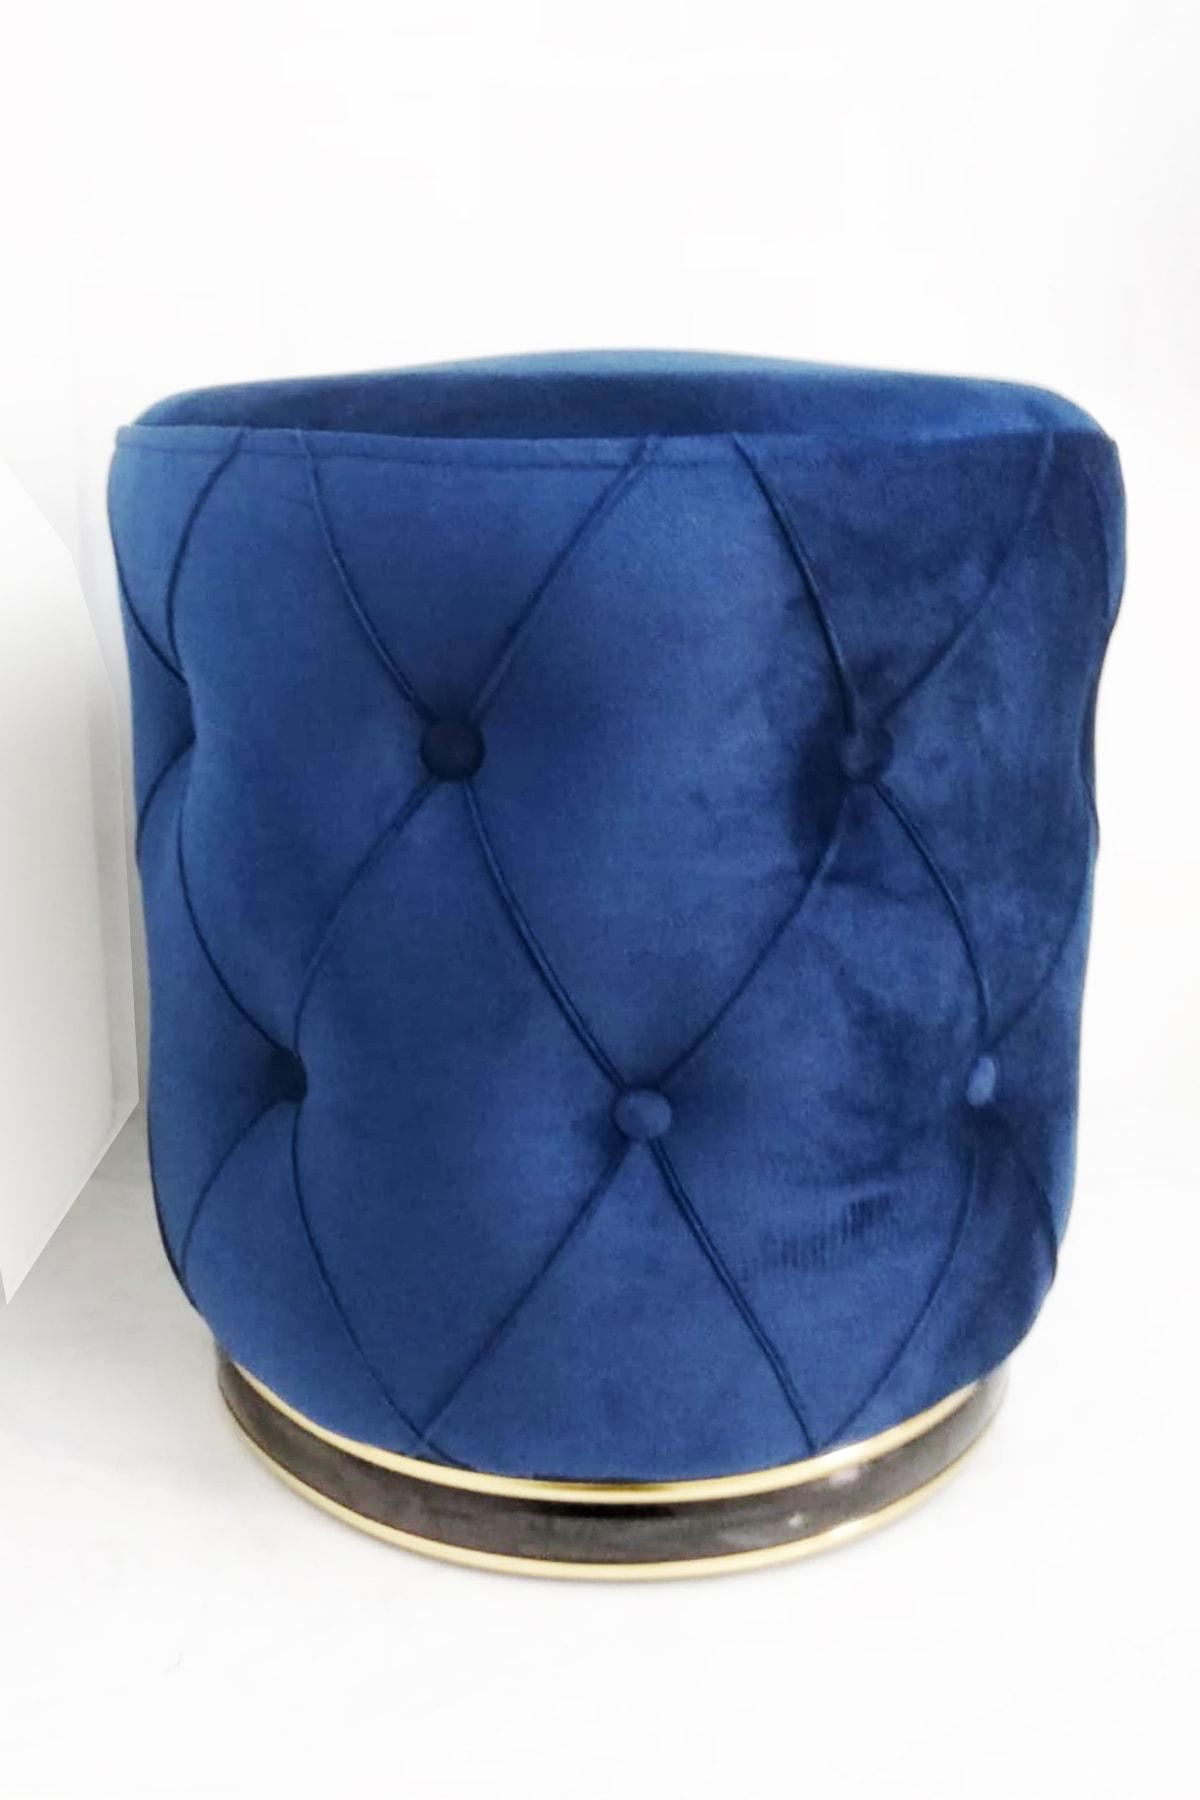 Zem Lunge Chester Blue - Gold Puf 2